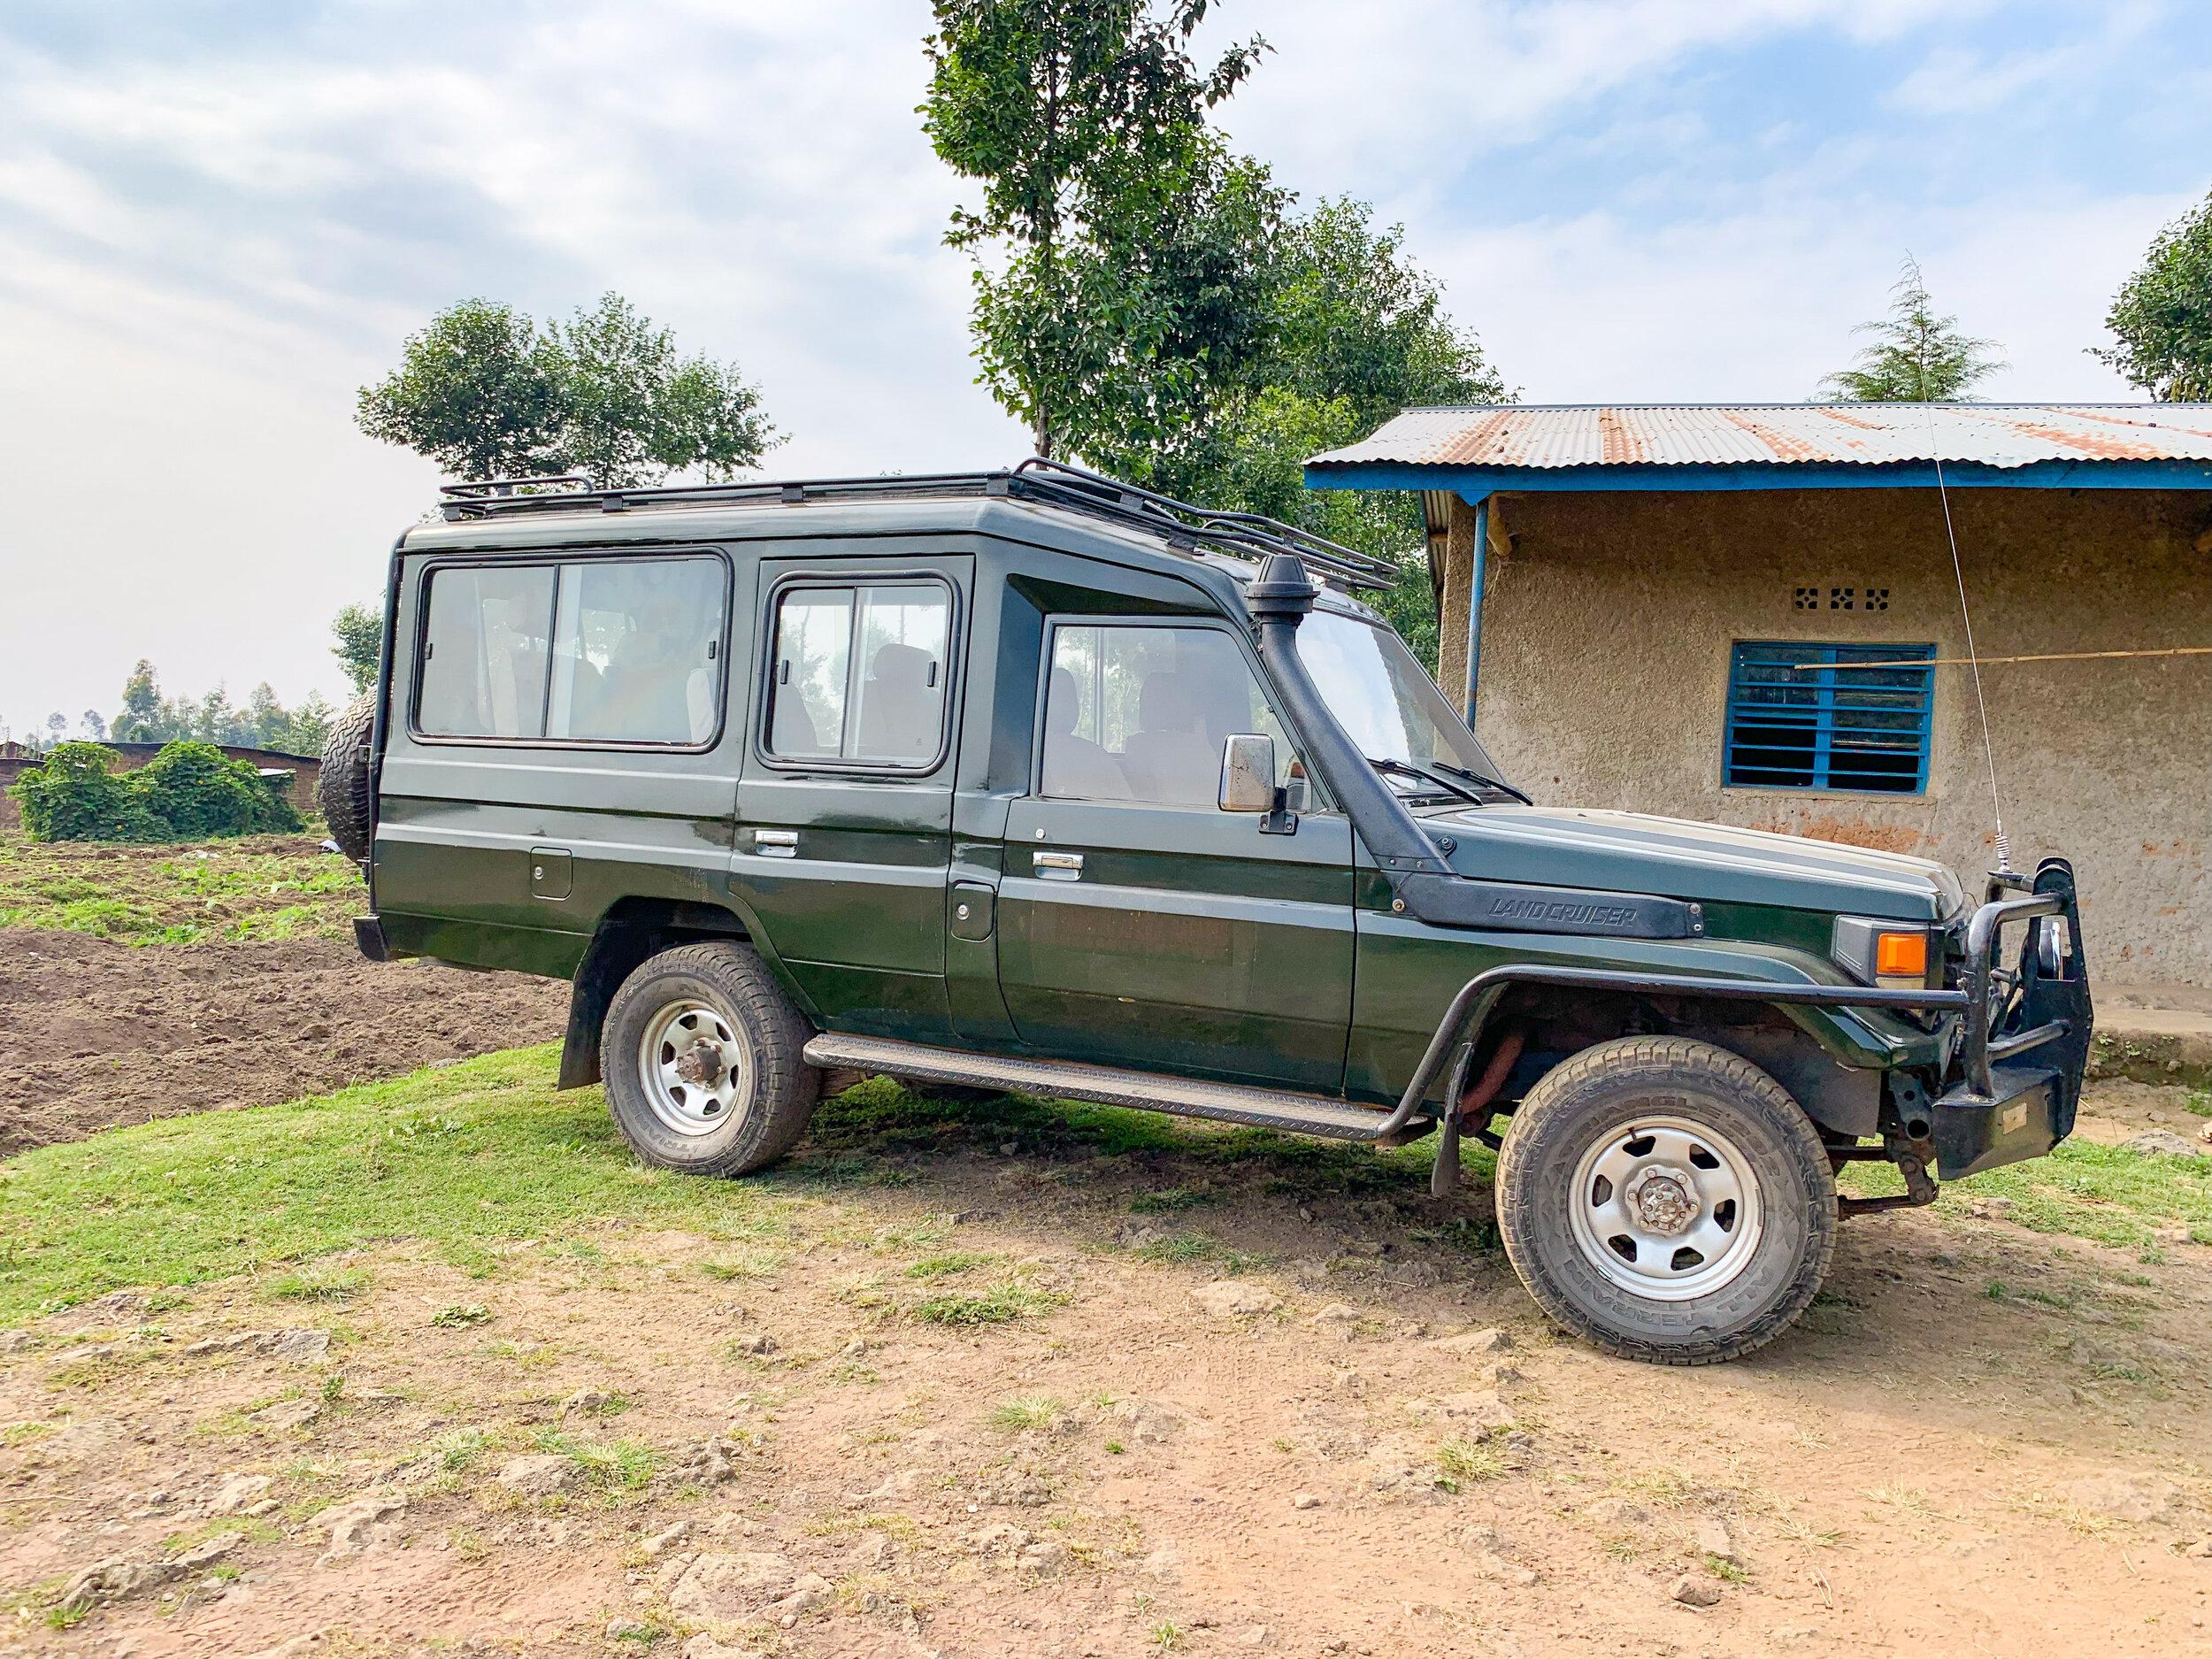 Africa_Rwanda_Gorilla_trek-safari_car.jpg